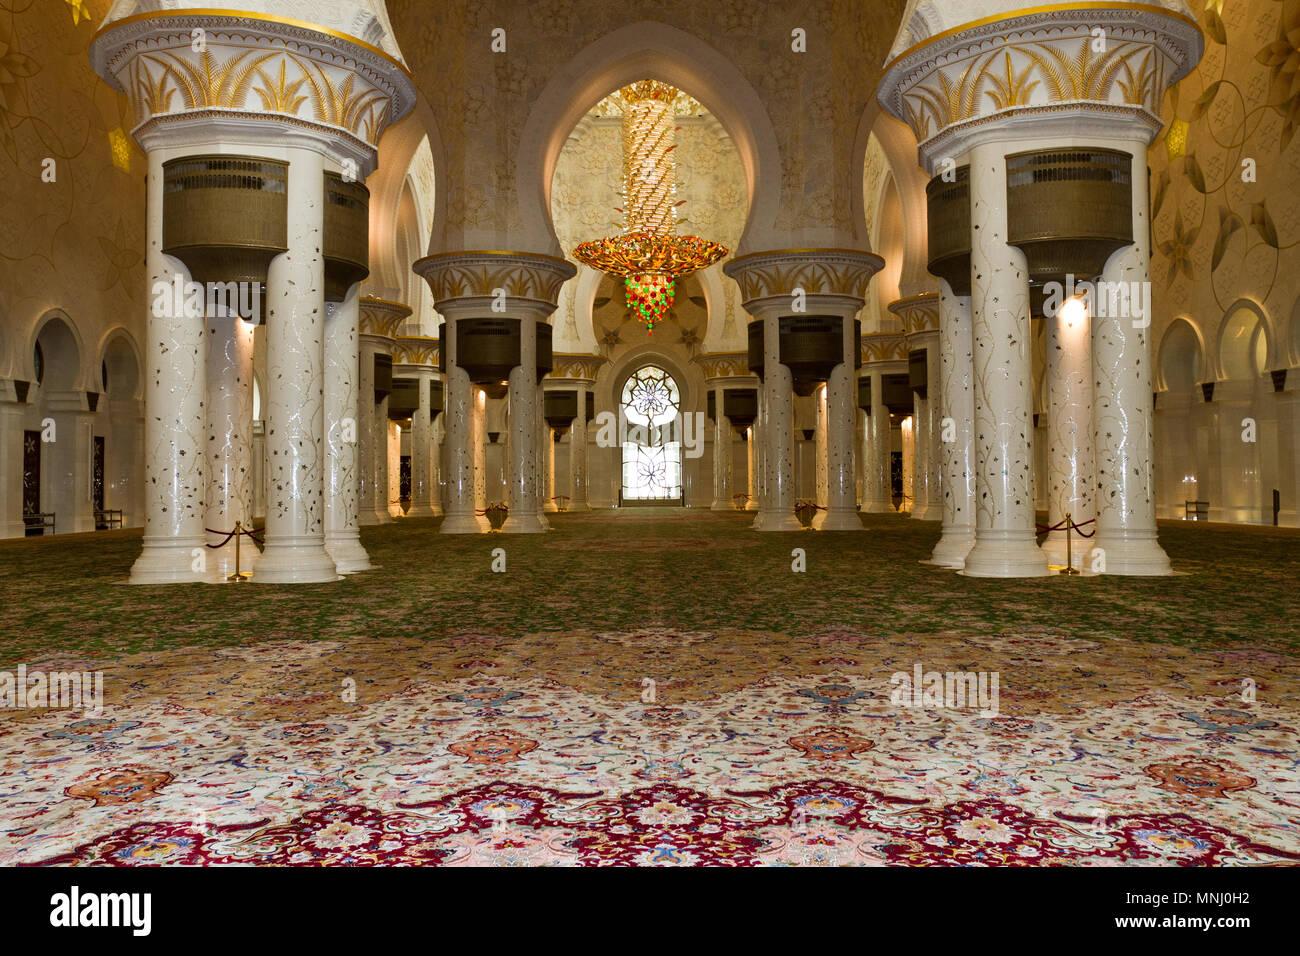 Sheikh Zayed Grand Mosque.  Scheich-Zayid-Moschee. Abu Dhabi. - Stock Image